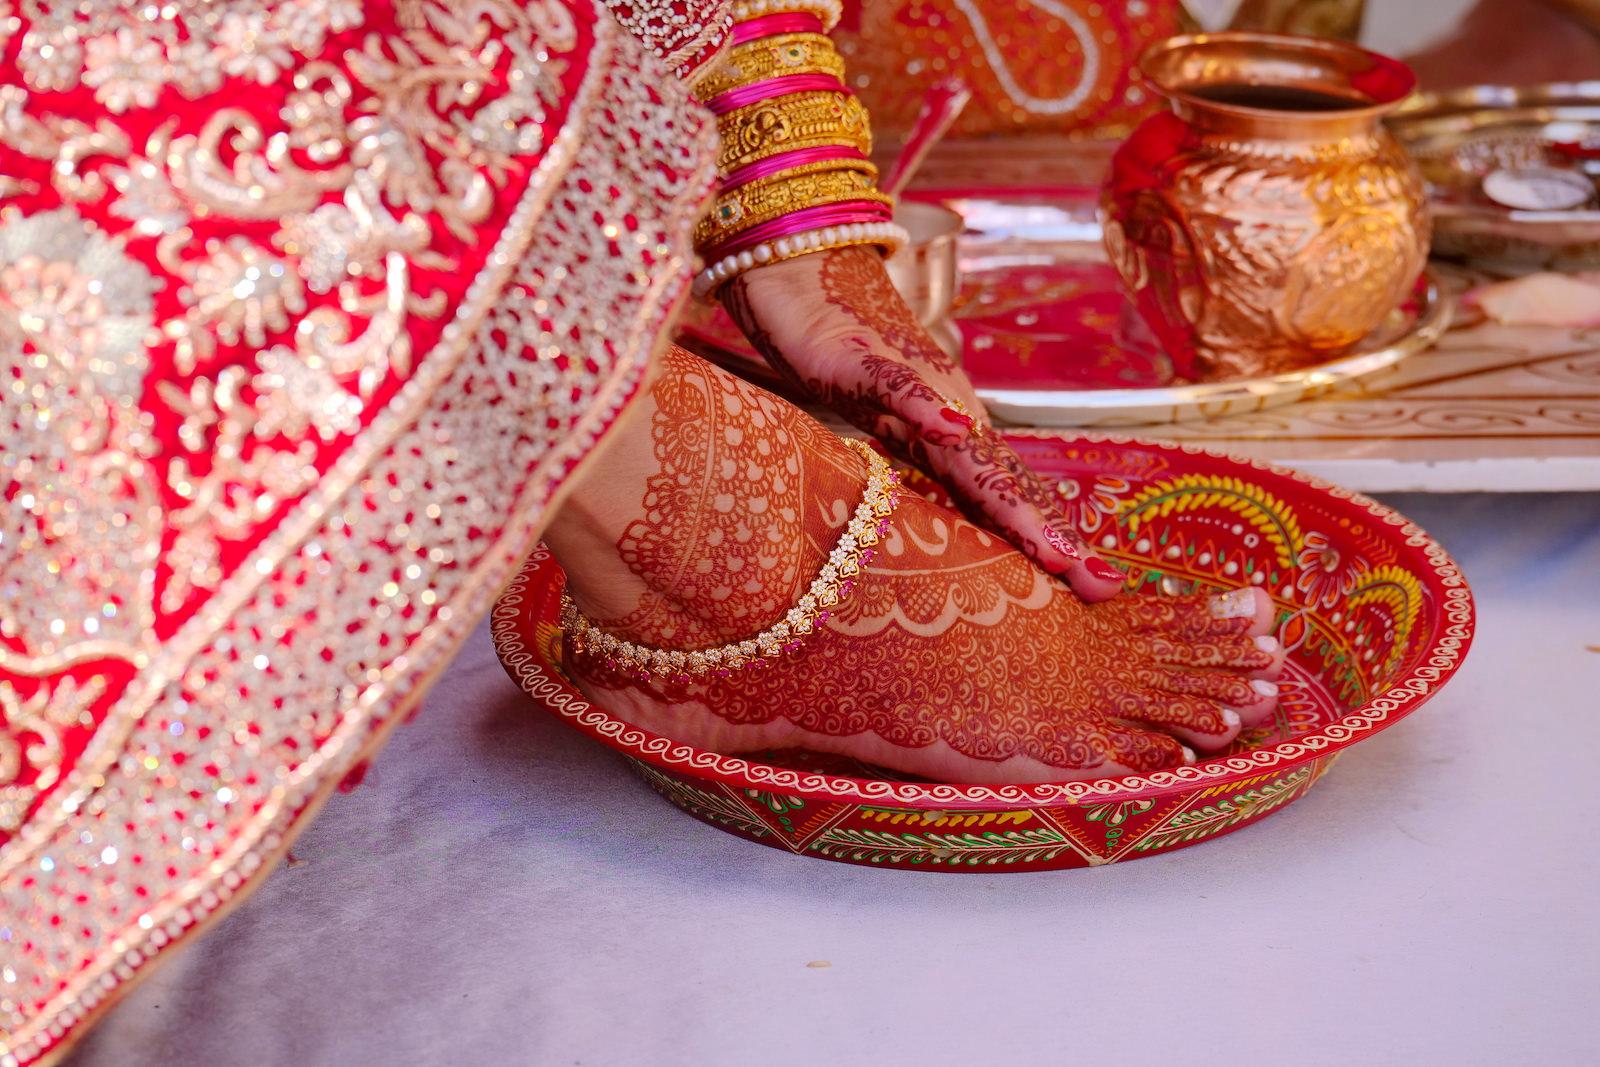 Traditional Indian Wedding Ceremony | Bride Foot Mendhi